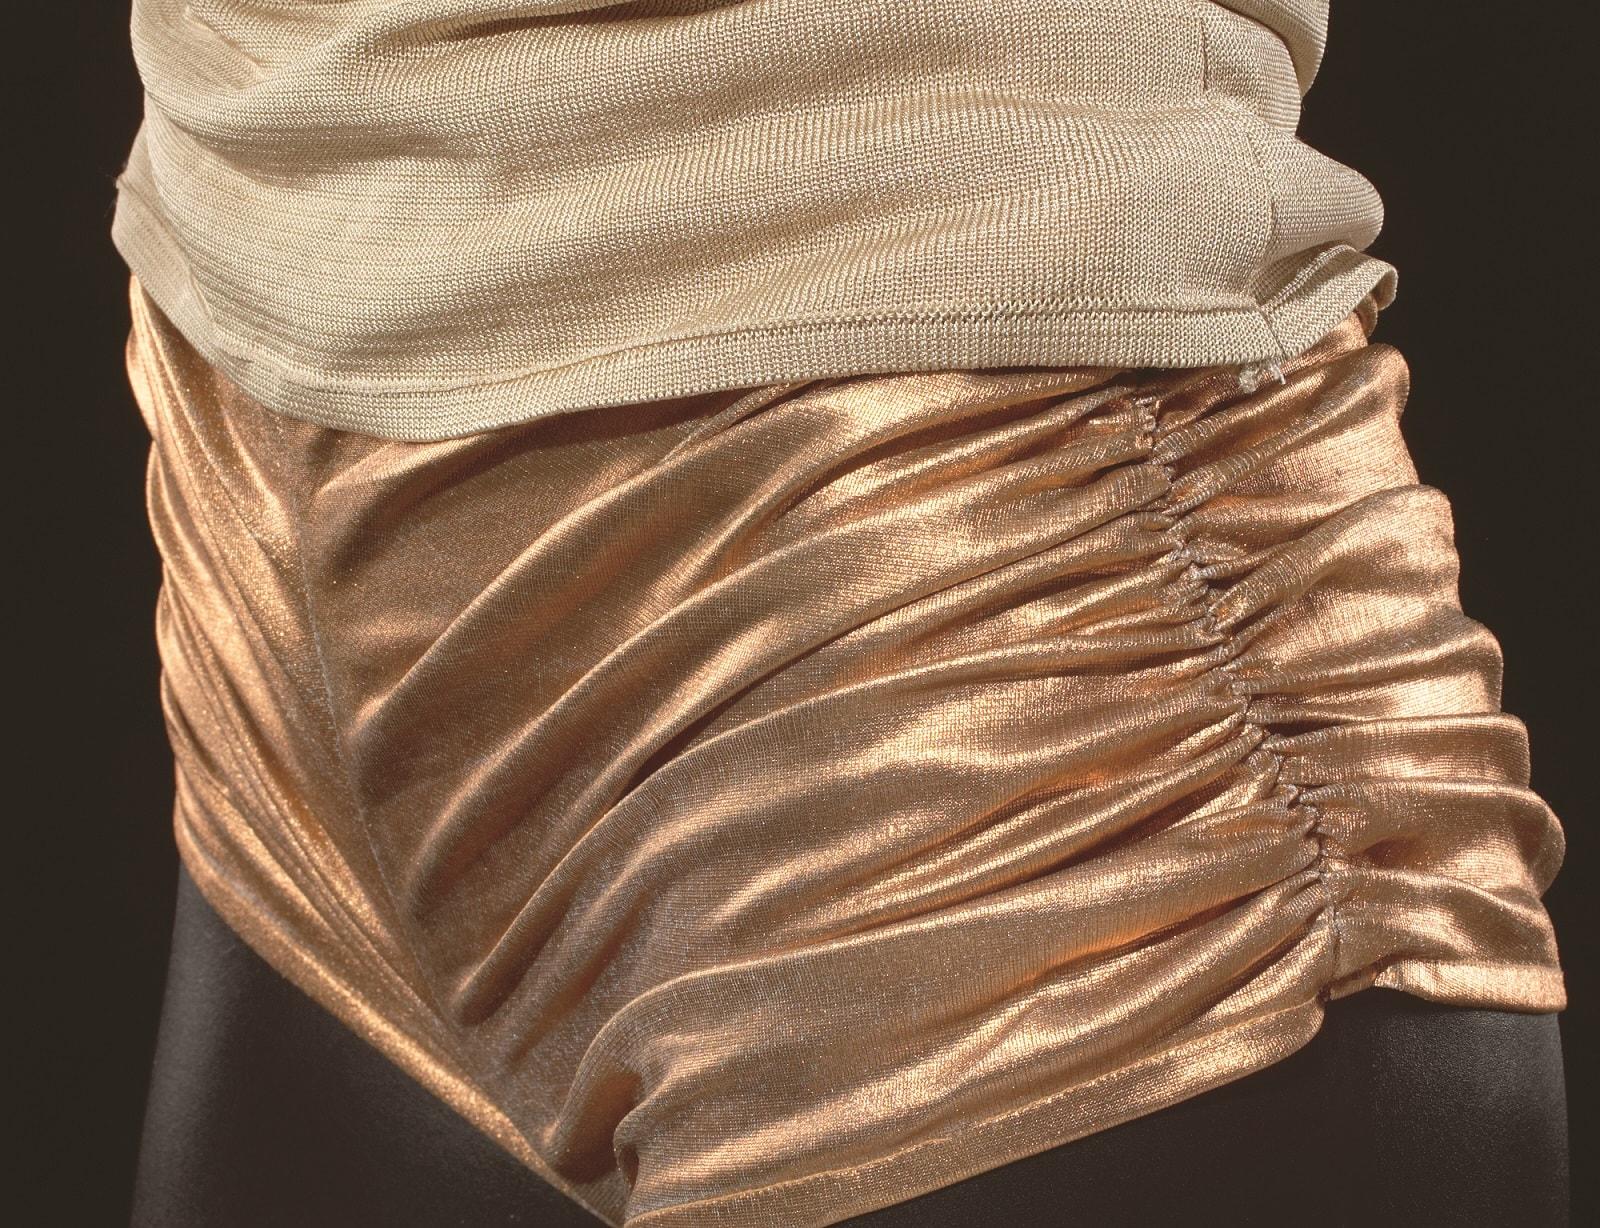 11. Kylie's hotpants